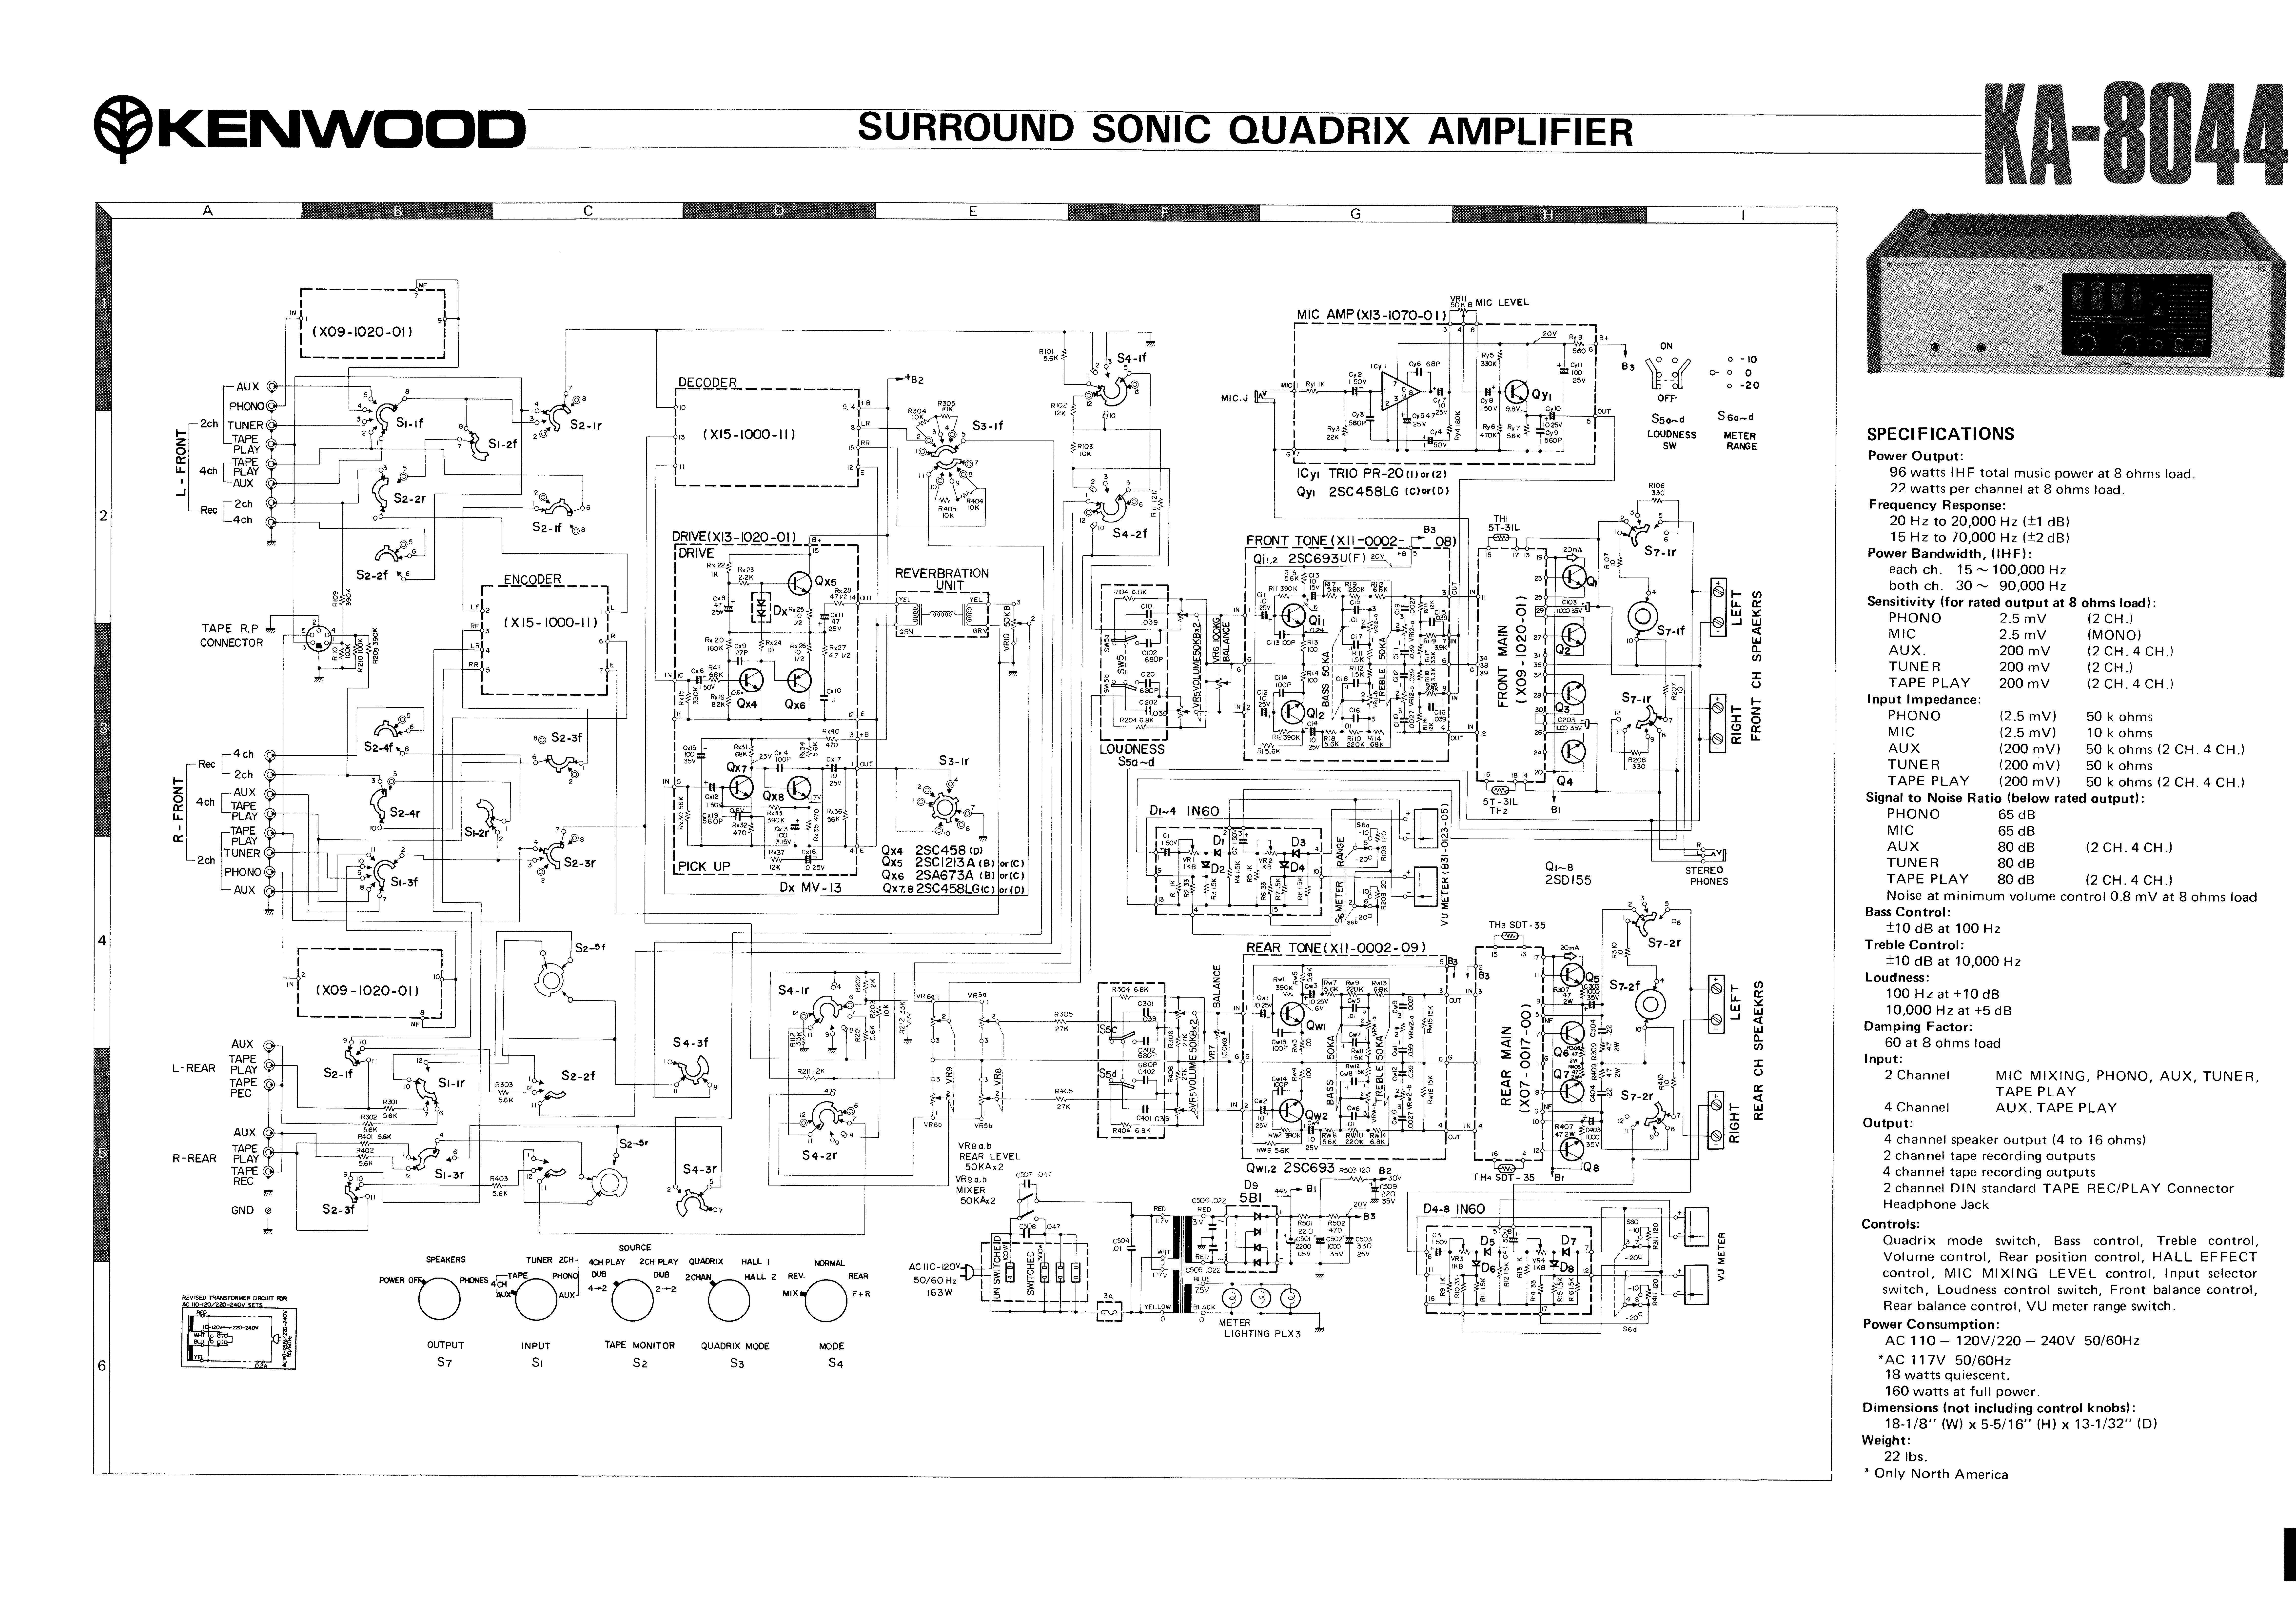 KENWOOD KA-8044 SCH service manual (1st page)